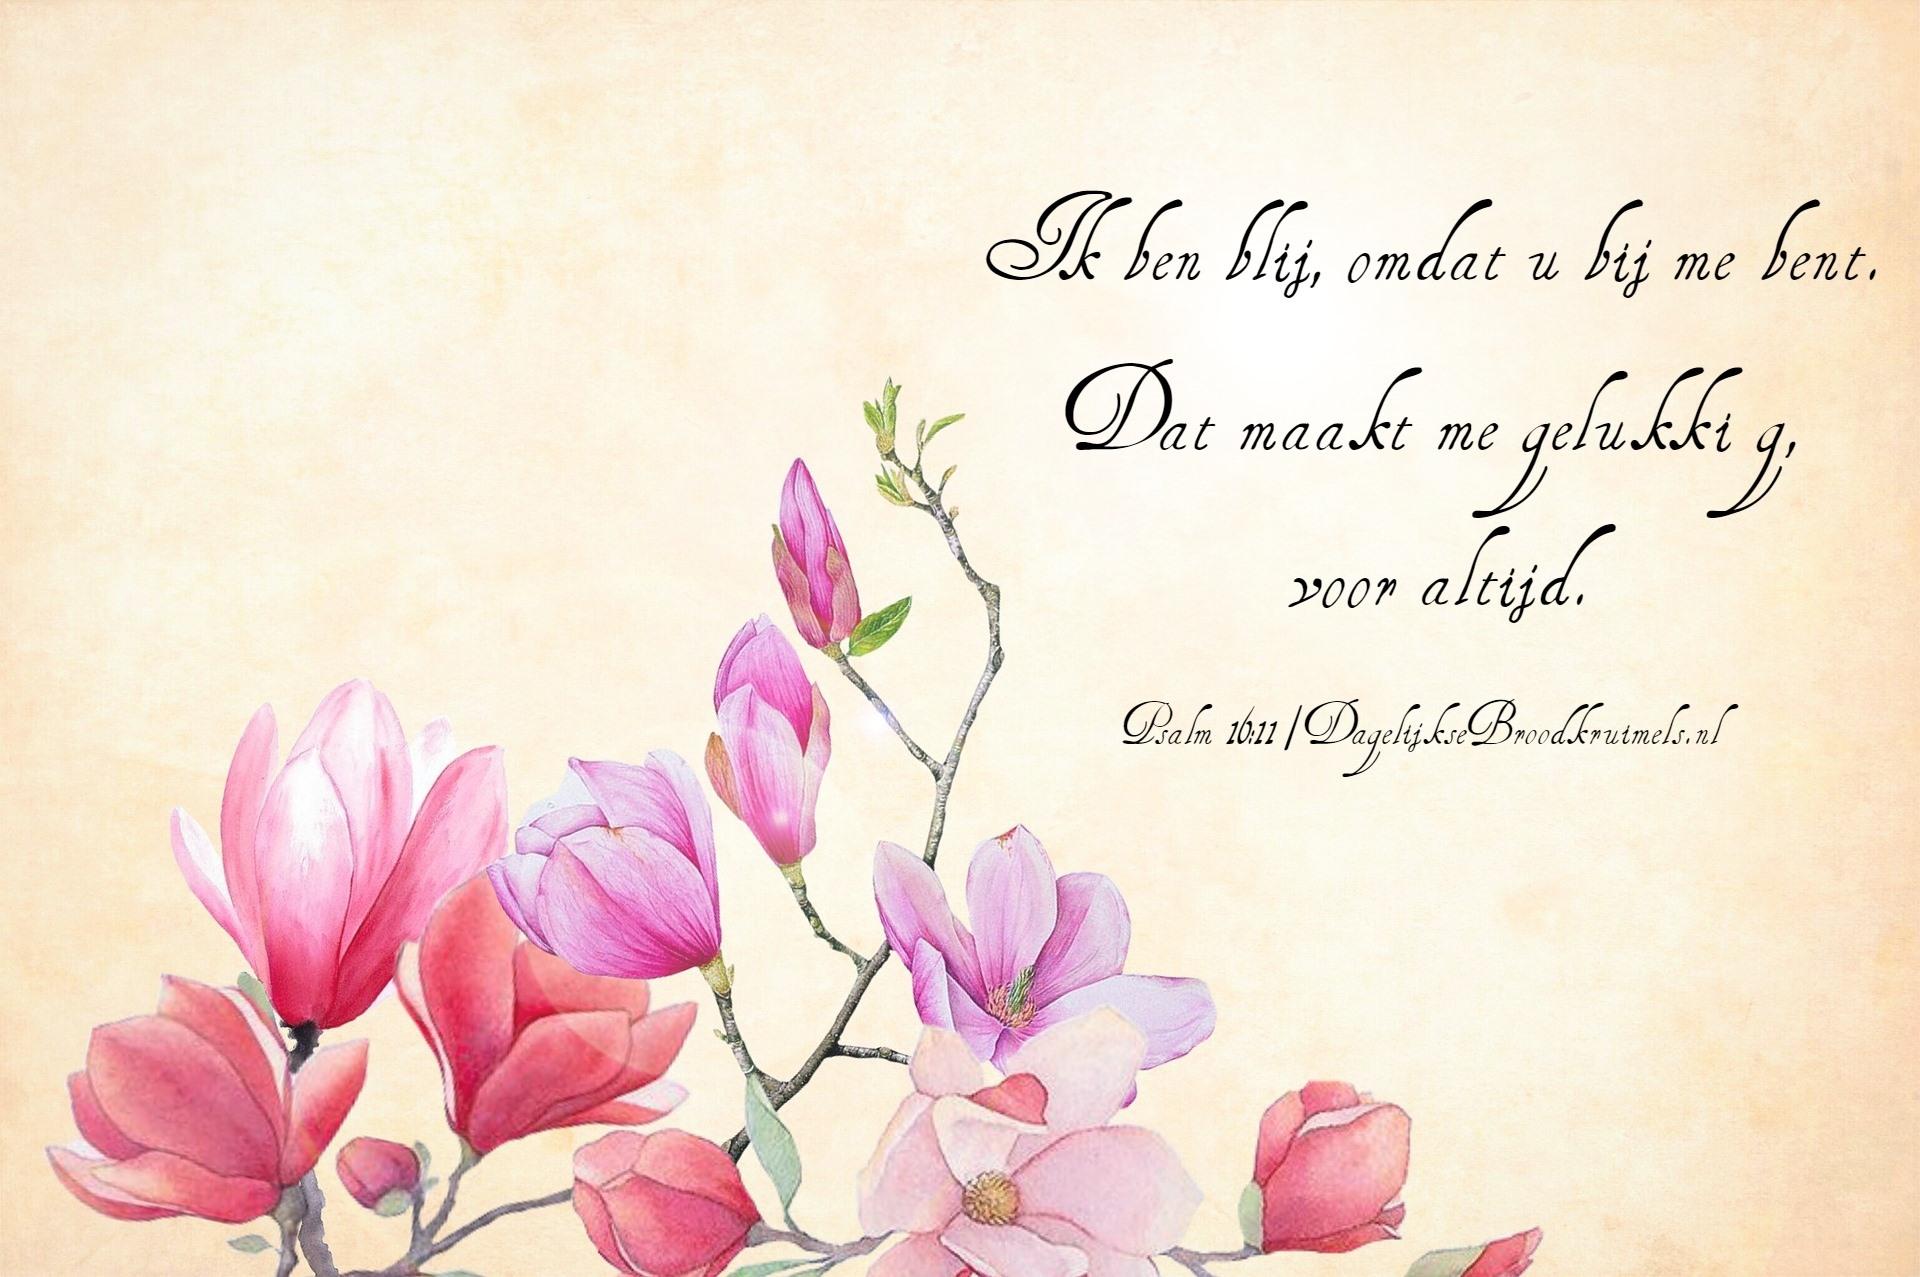 Psalm 16 vers 11